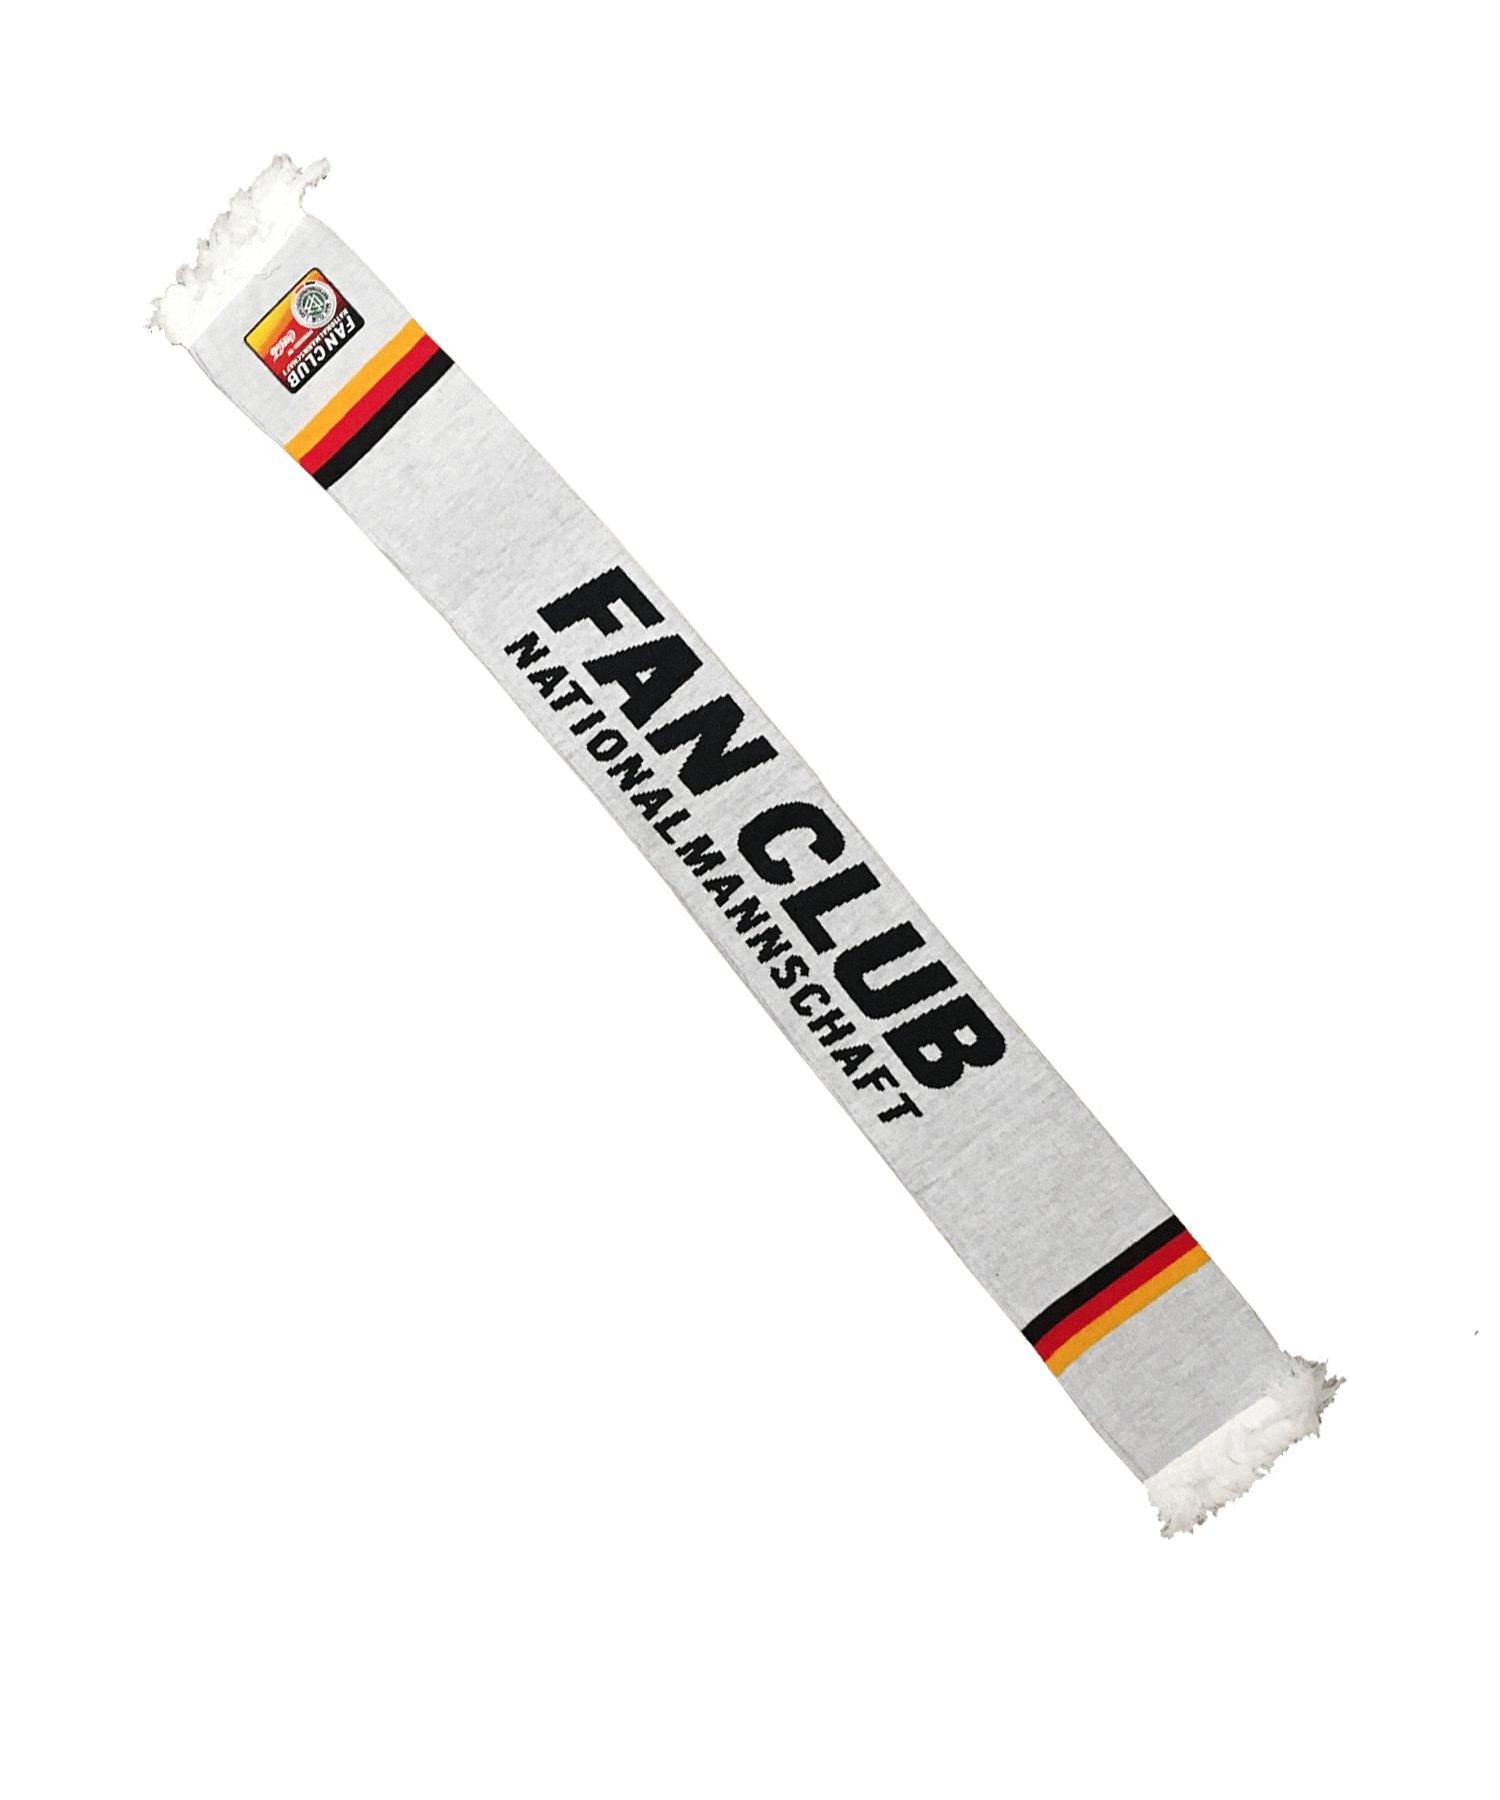 DFB Deutschland Fan Club Schal Weiss - weiss